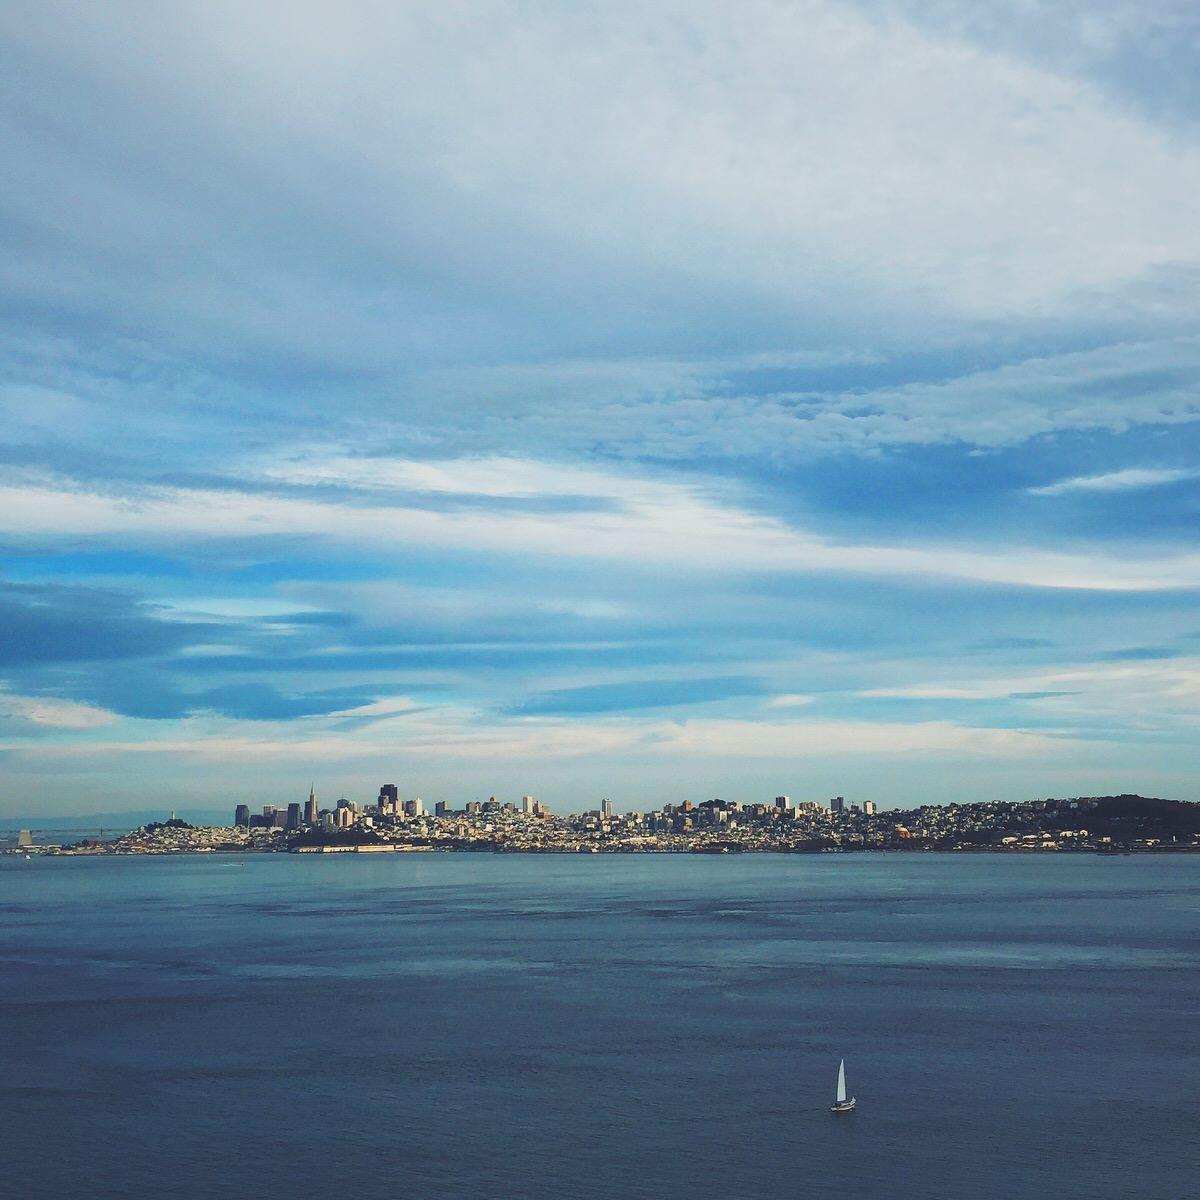 San Francisco skyline from Marin County, California